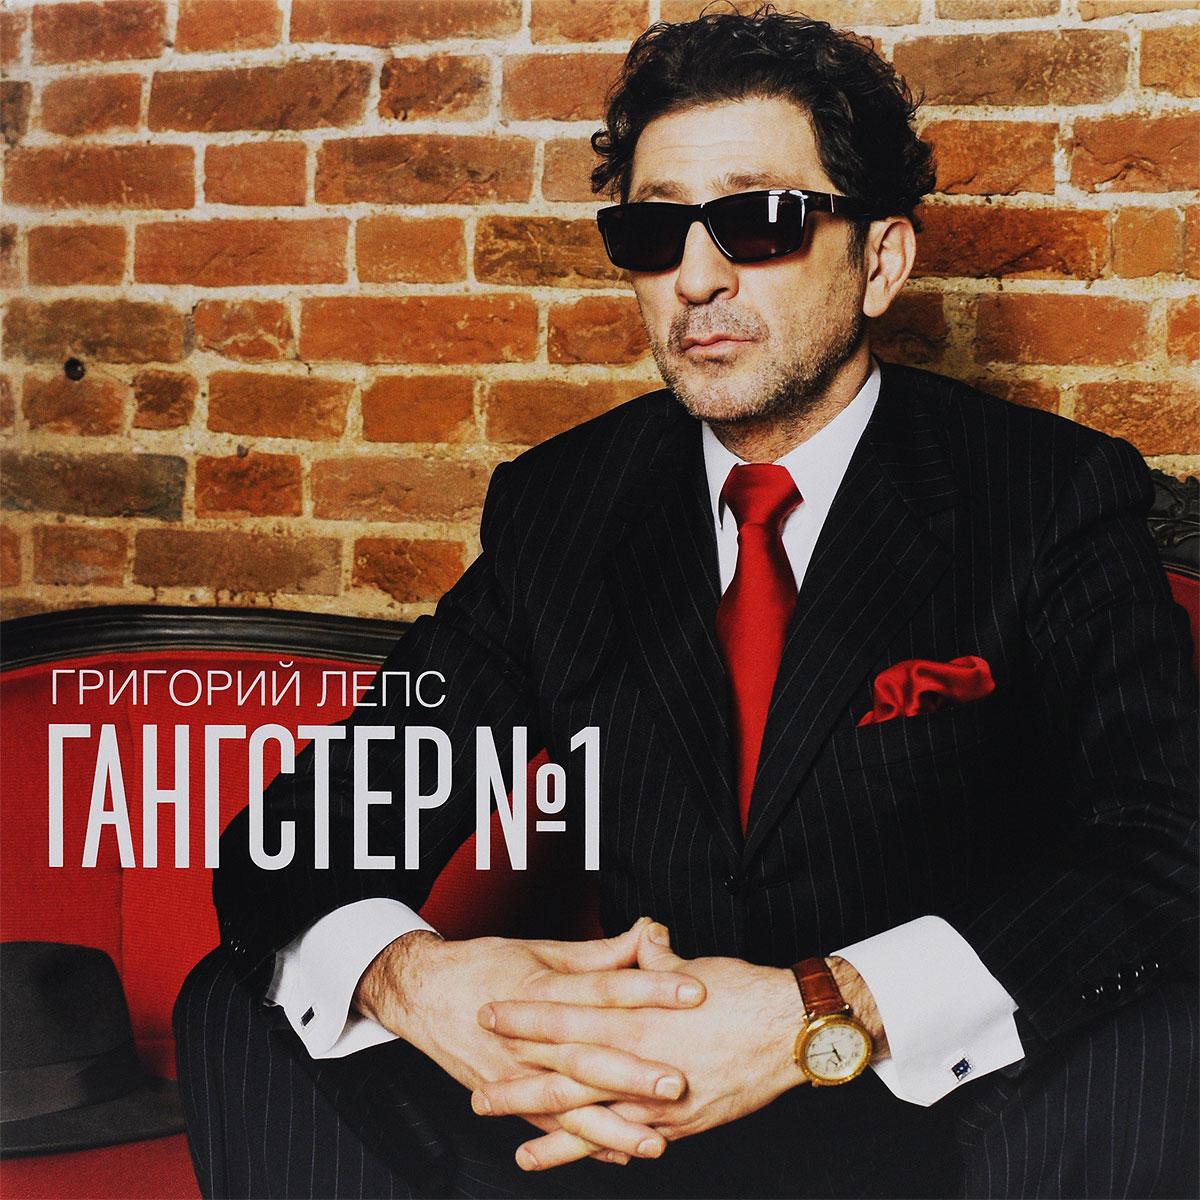 Григорий Лепс Григорий Лепс. Гангстер №1 (2 LP) григорий лепс парус live